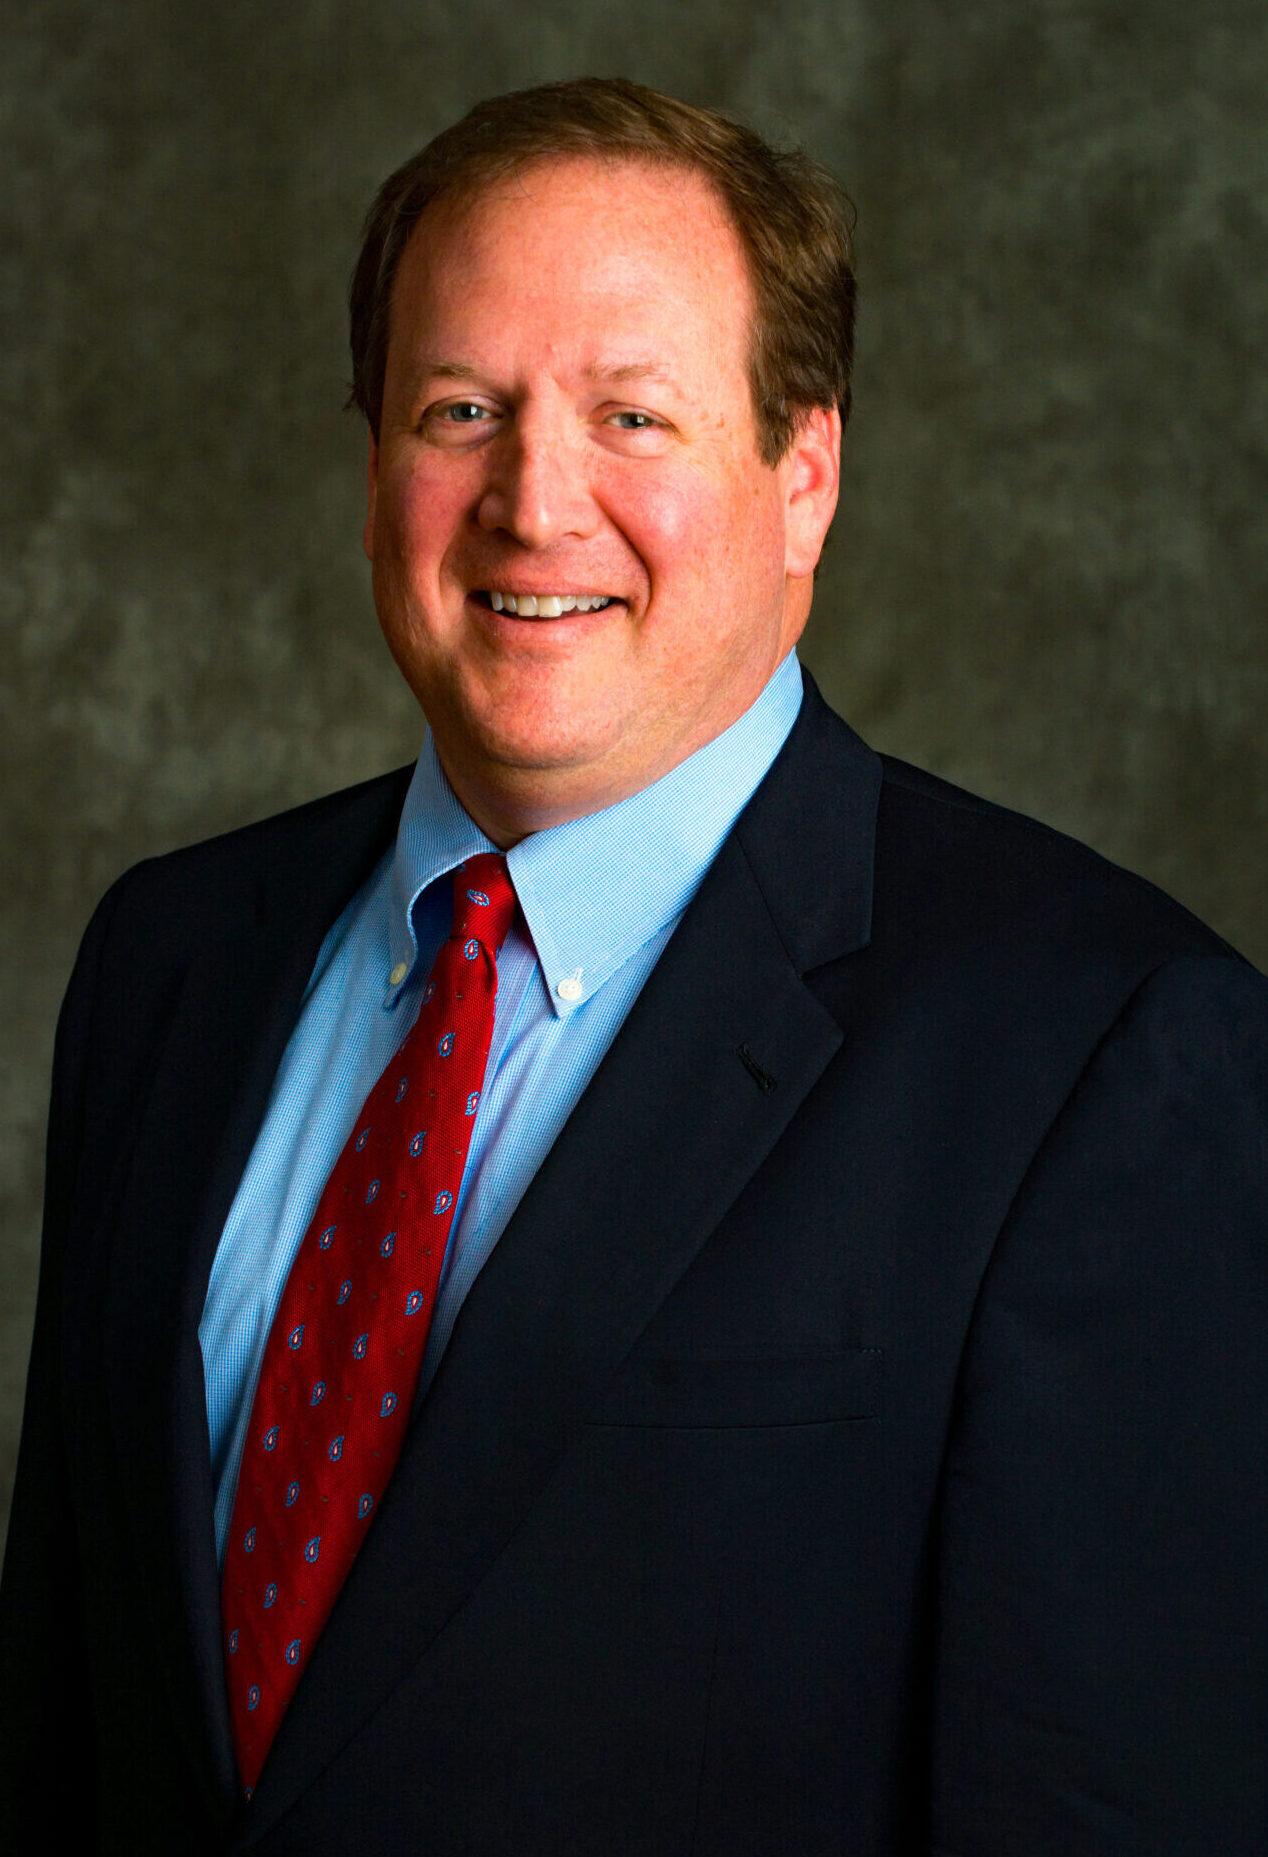 David P. Sanders